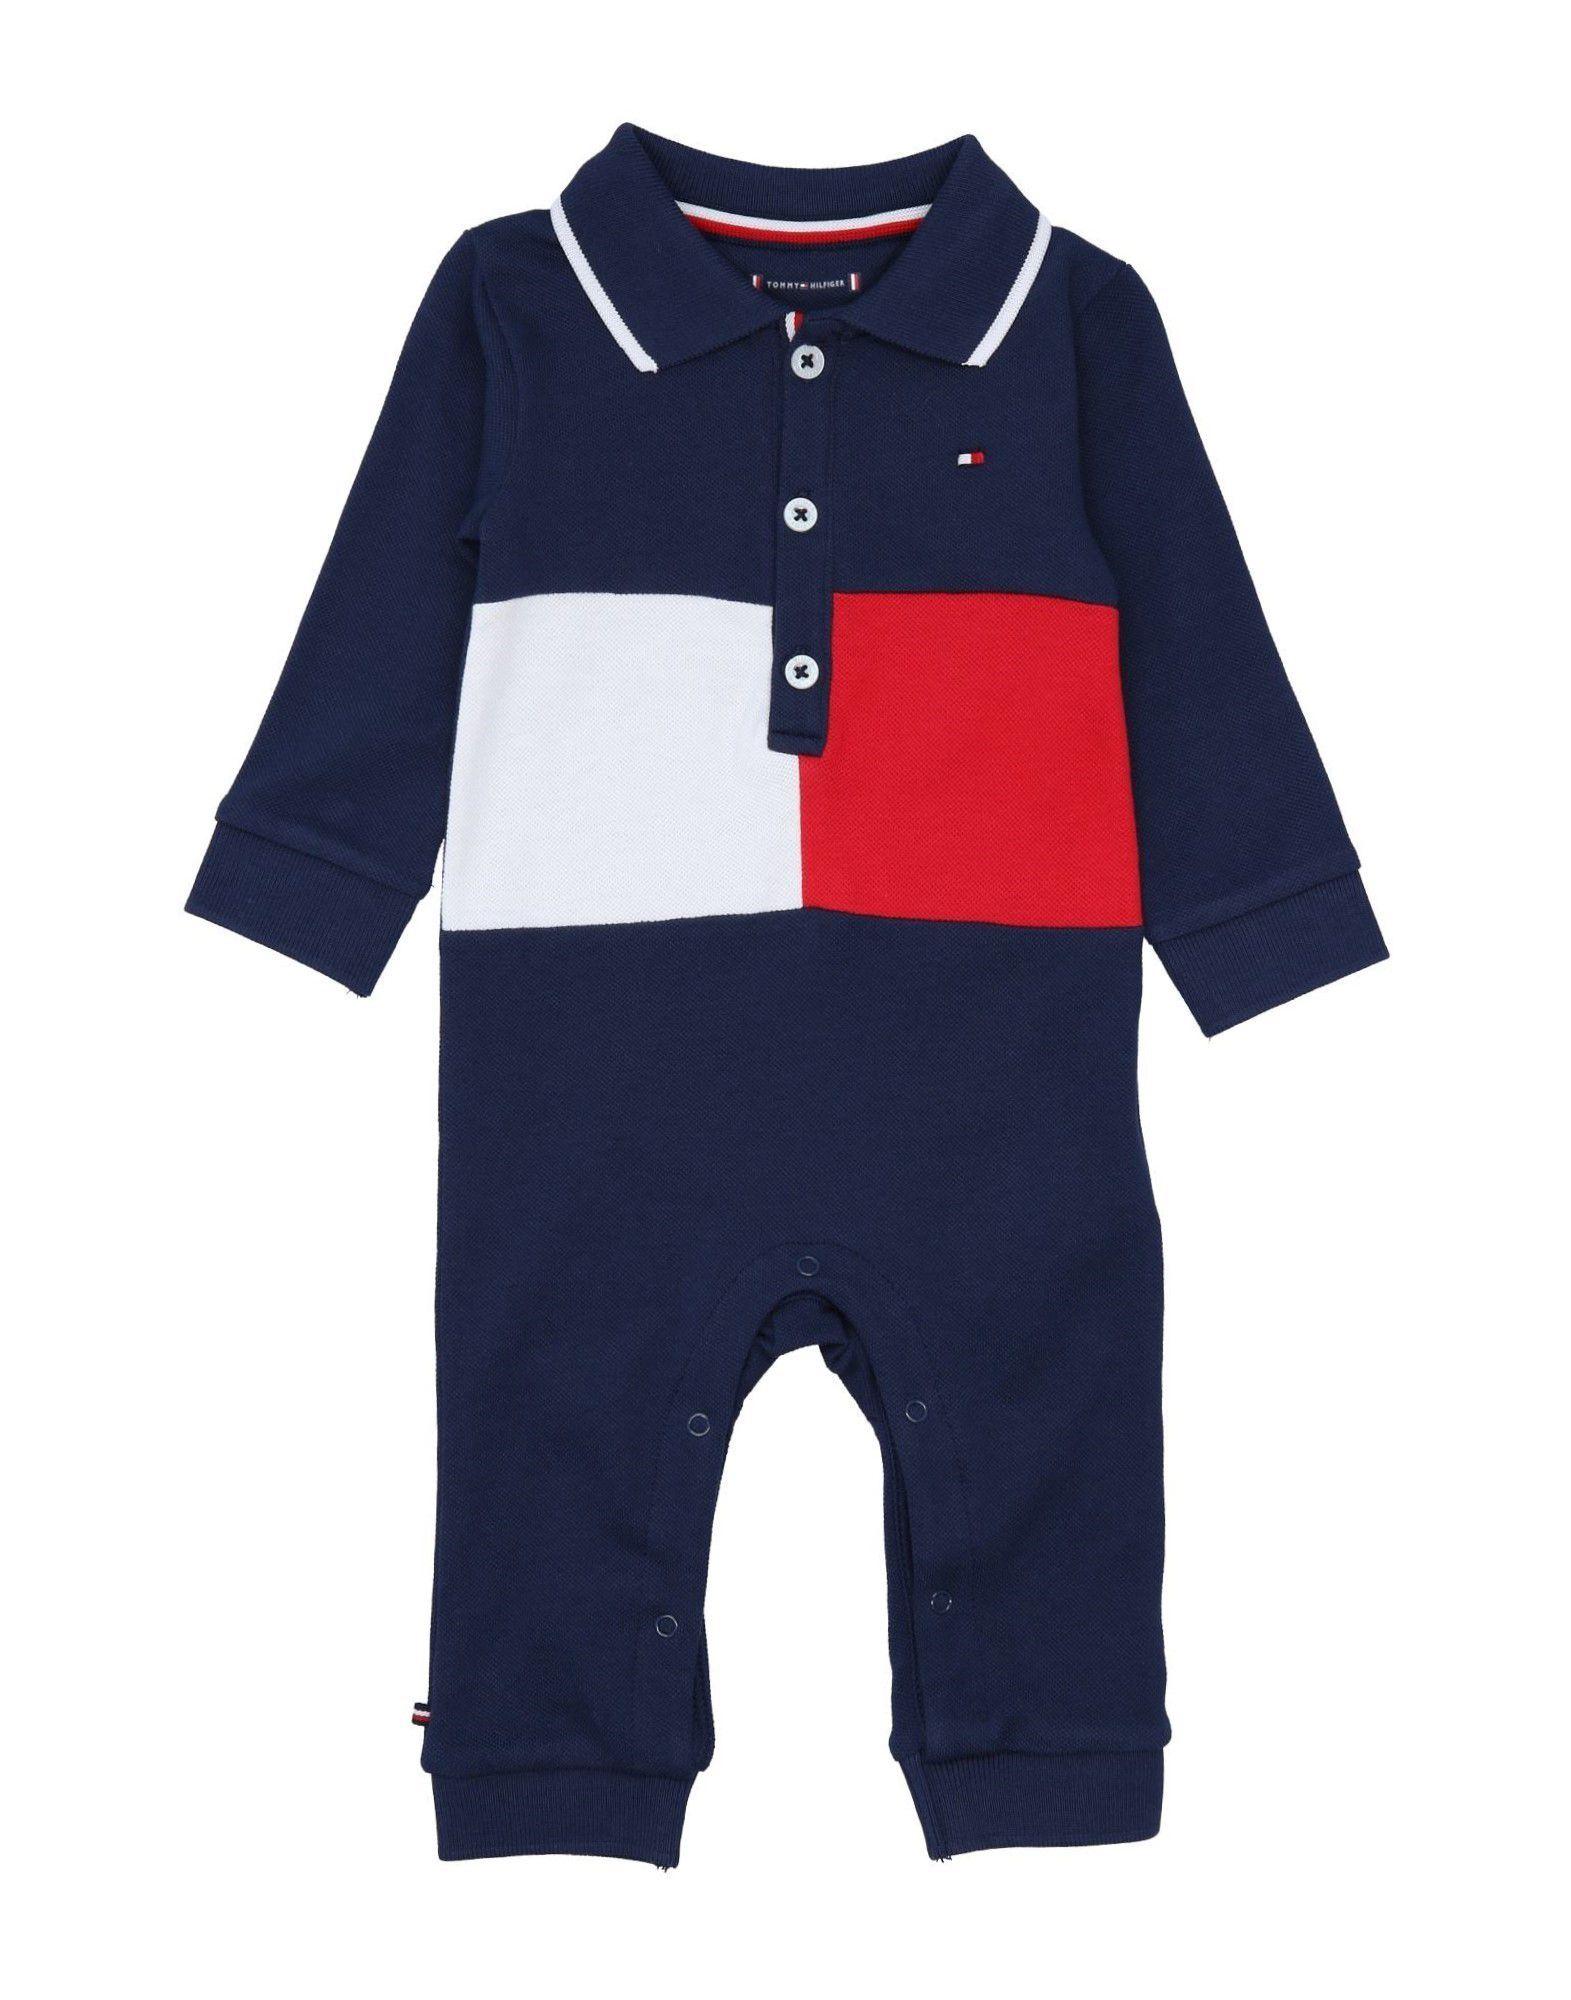 02b995af984 Φορμάκια Κορμάκια Αγόρι Tommy Hilfiger 0-24 μηνών - Παιδικά ρούχα στο YOOX